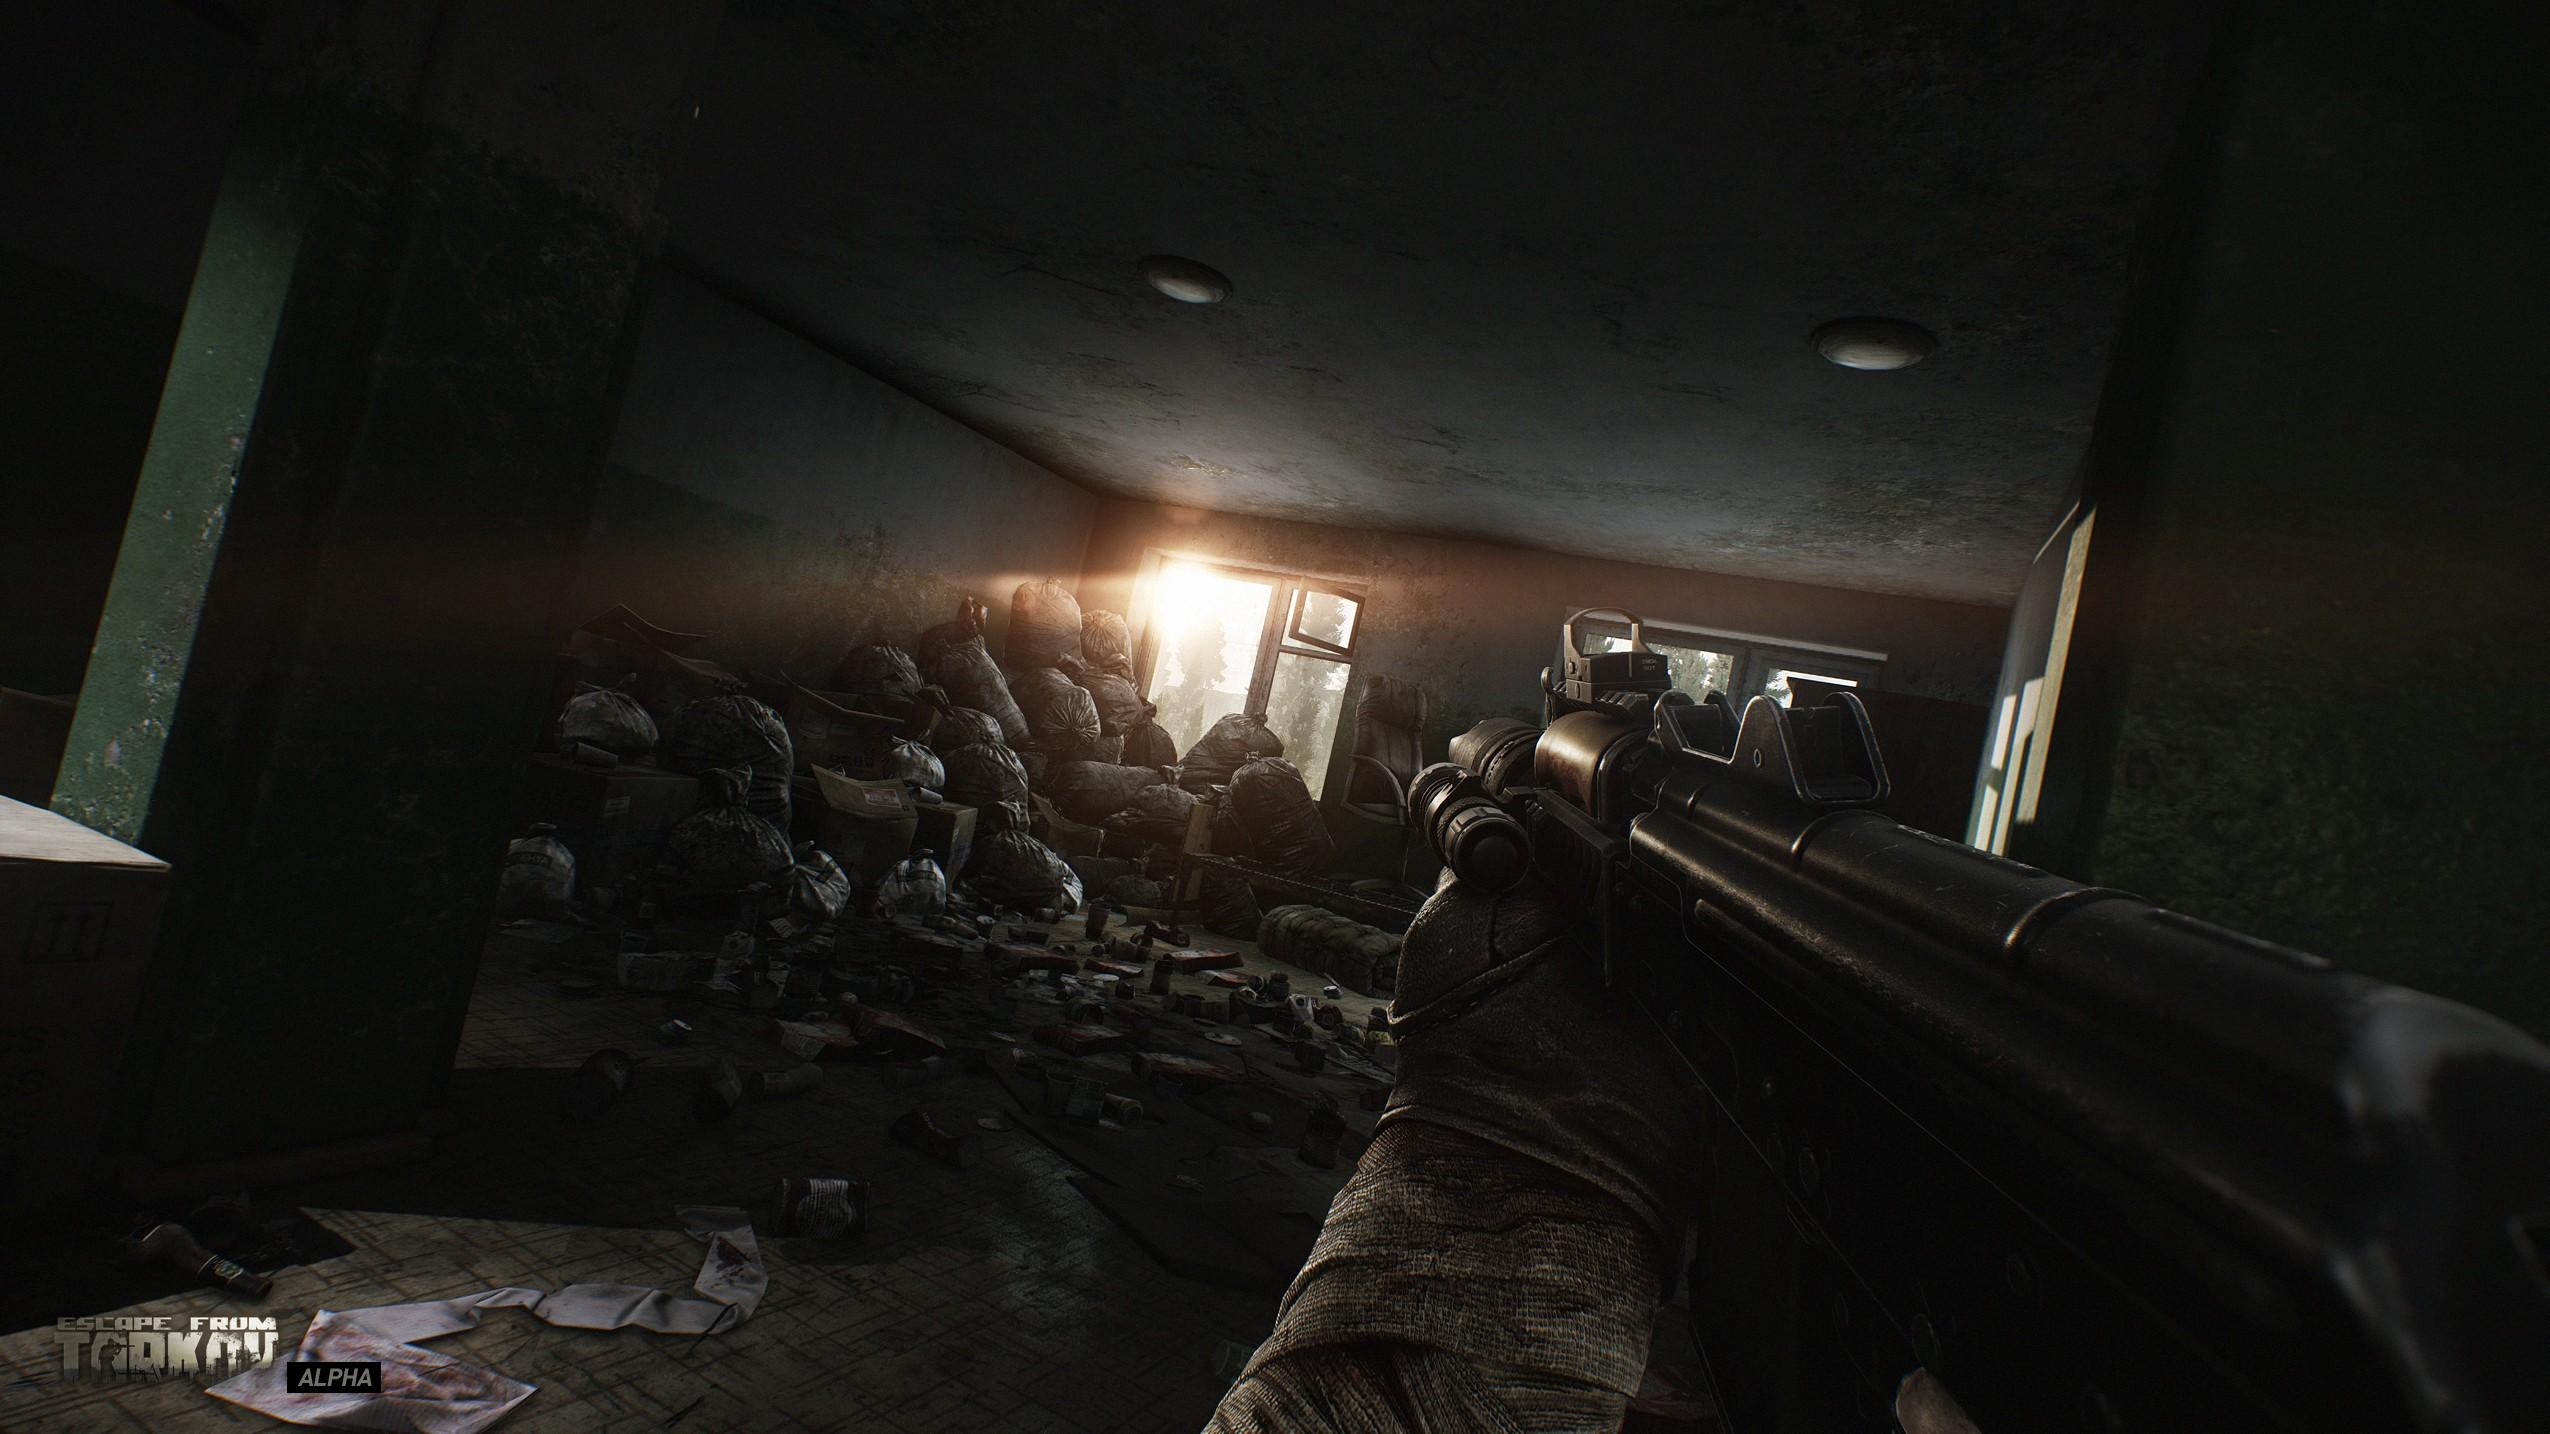 Wallpaper : video games, Escape from Tarkov, videojuegos